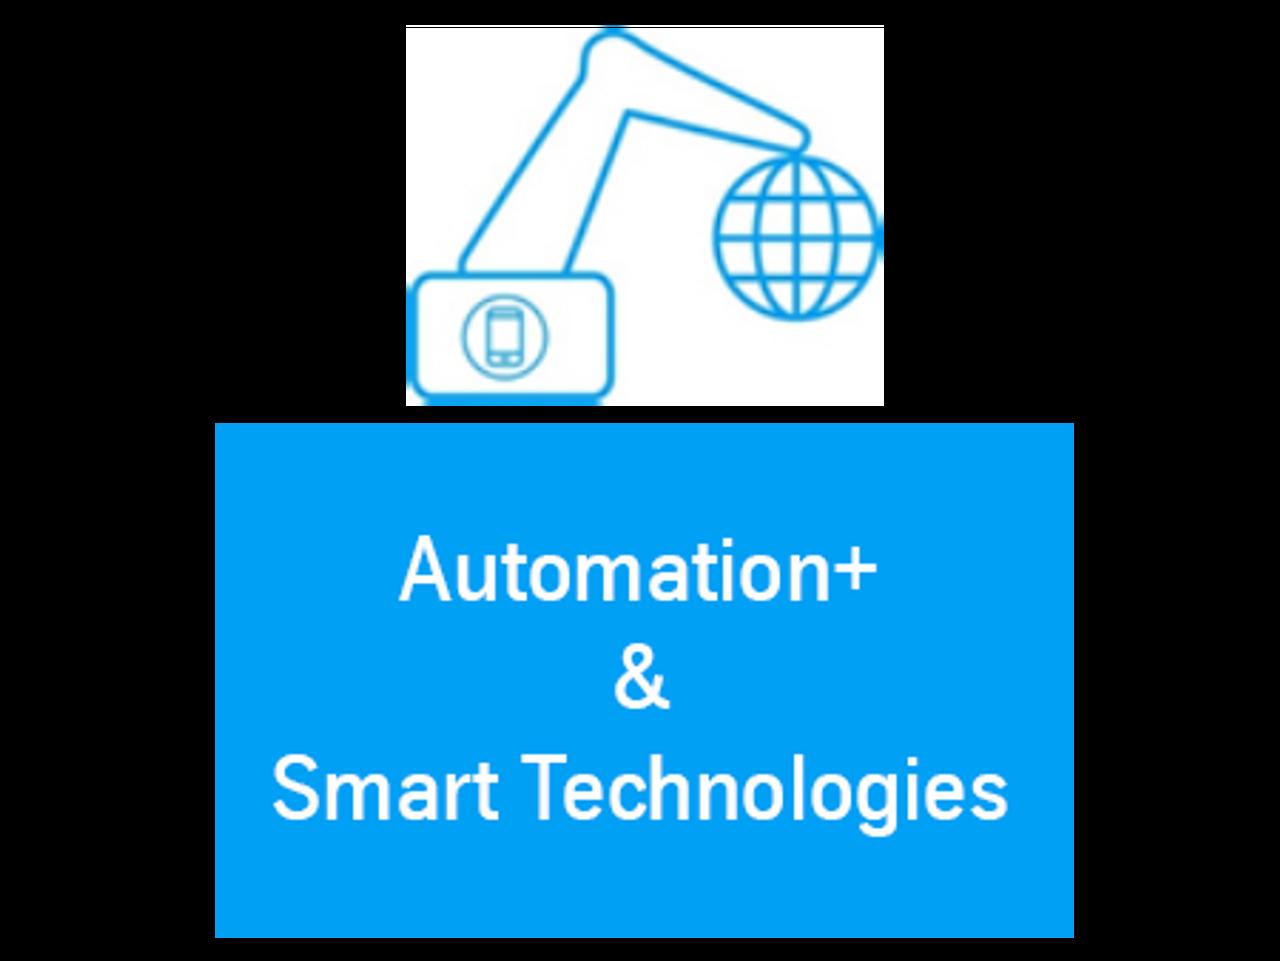 Automation+ & Smart Technologies thyssenkrupp automation engineering